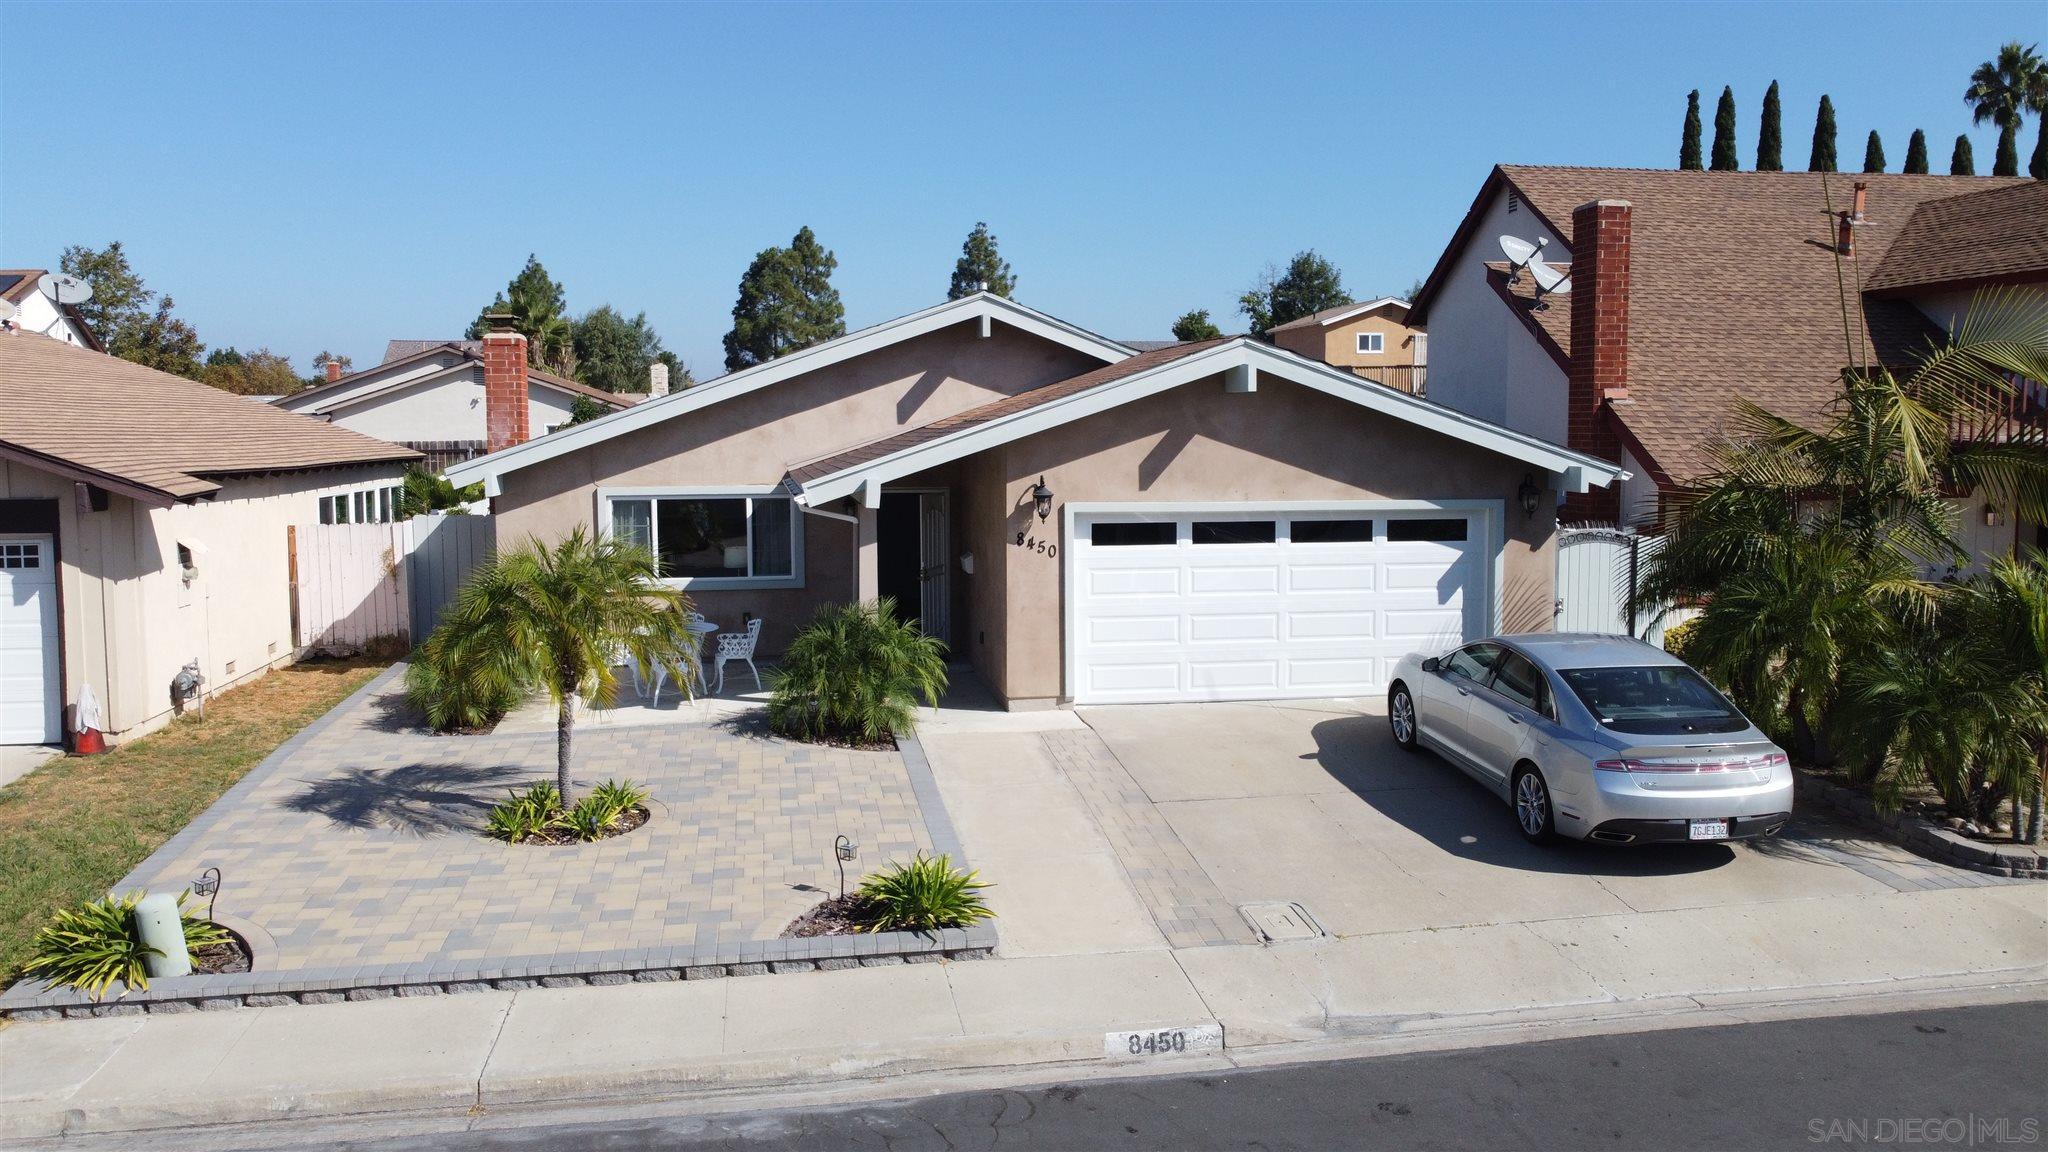 8450 Aries Rd., San Diego, CA 92126